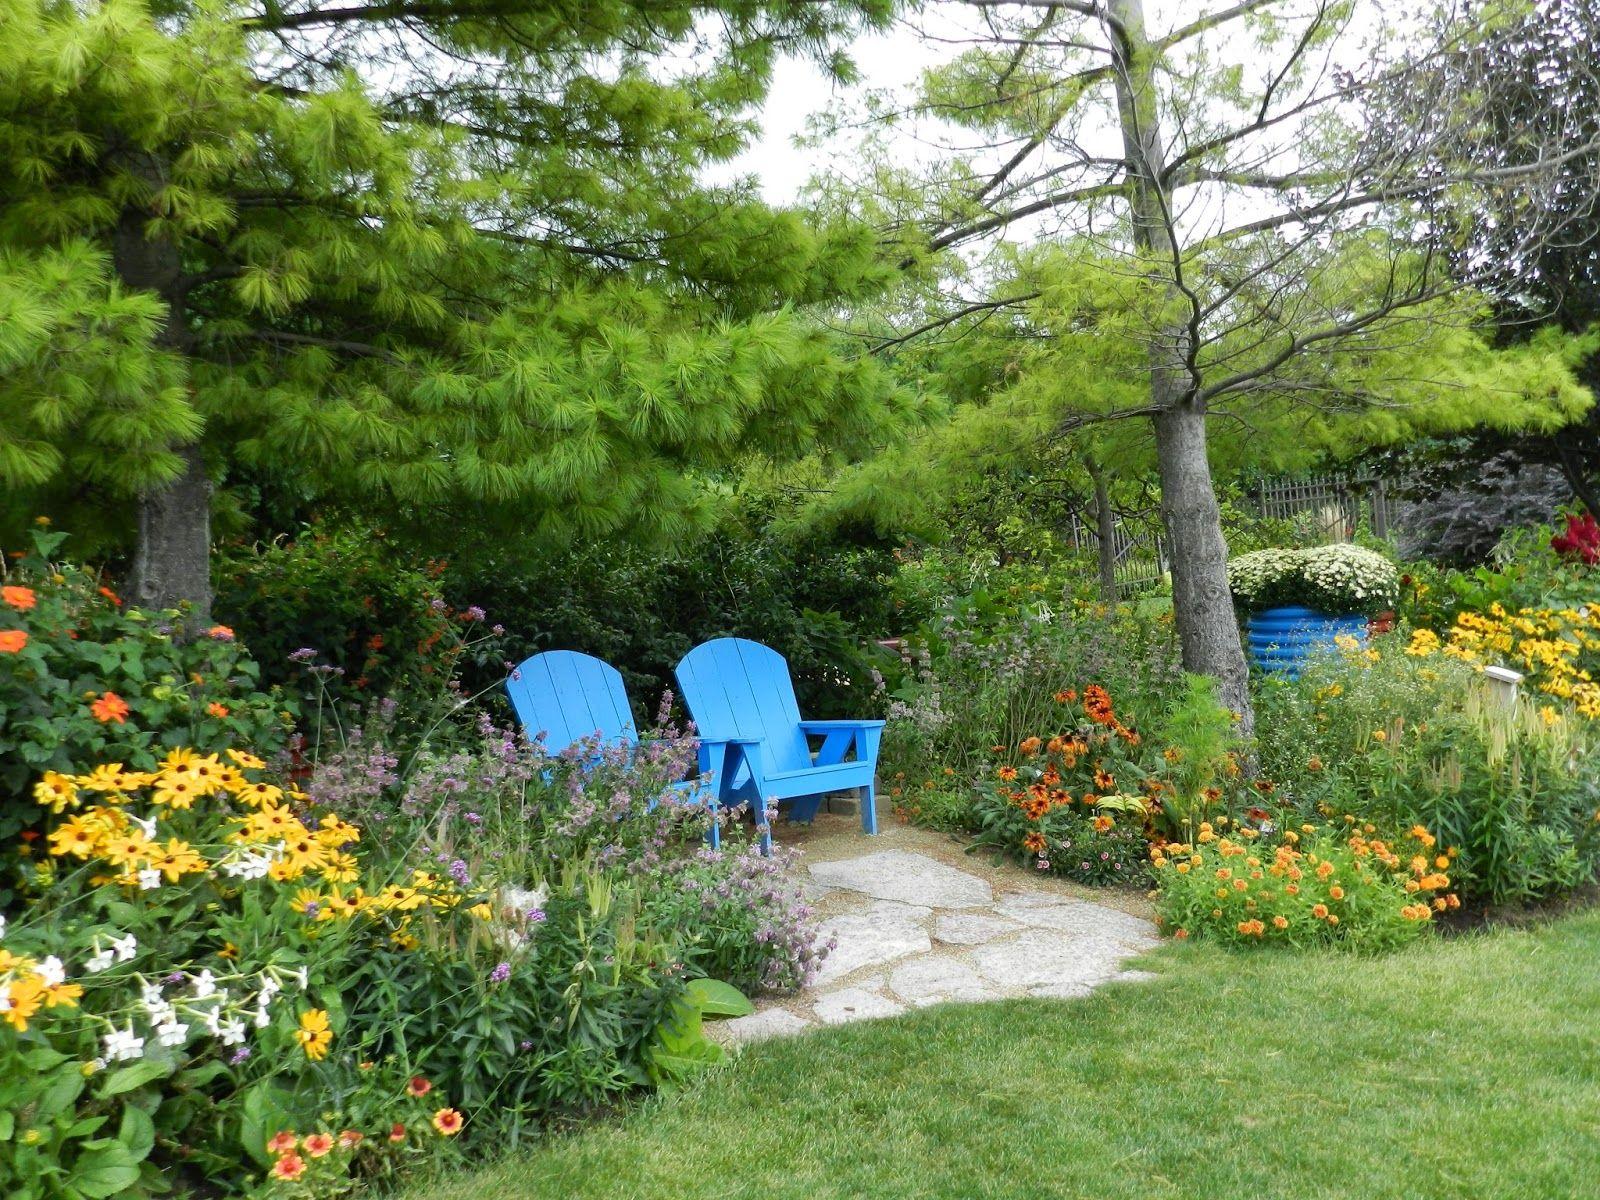 Attirant Prairie Roseu0027s Garden: A Wisconsin Garden Gem